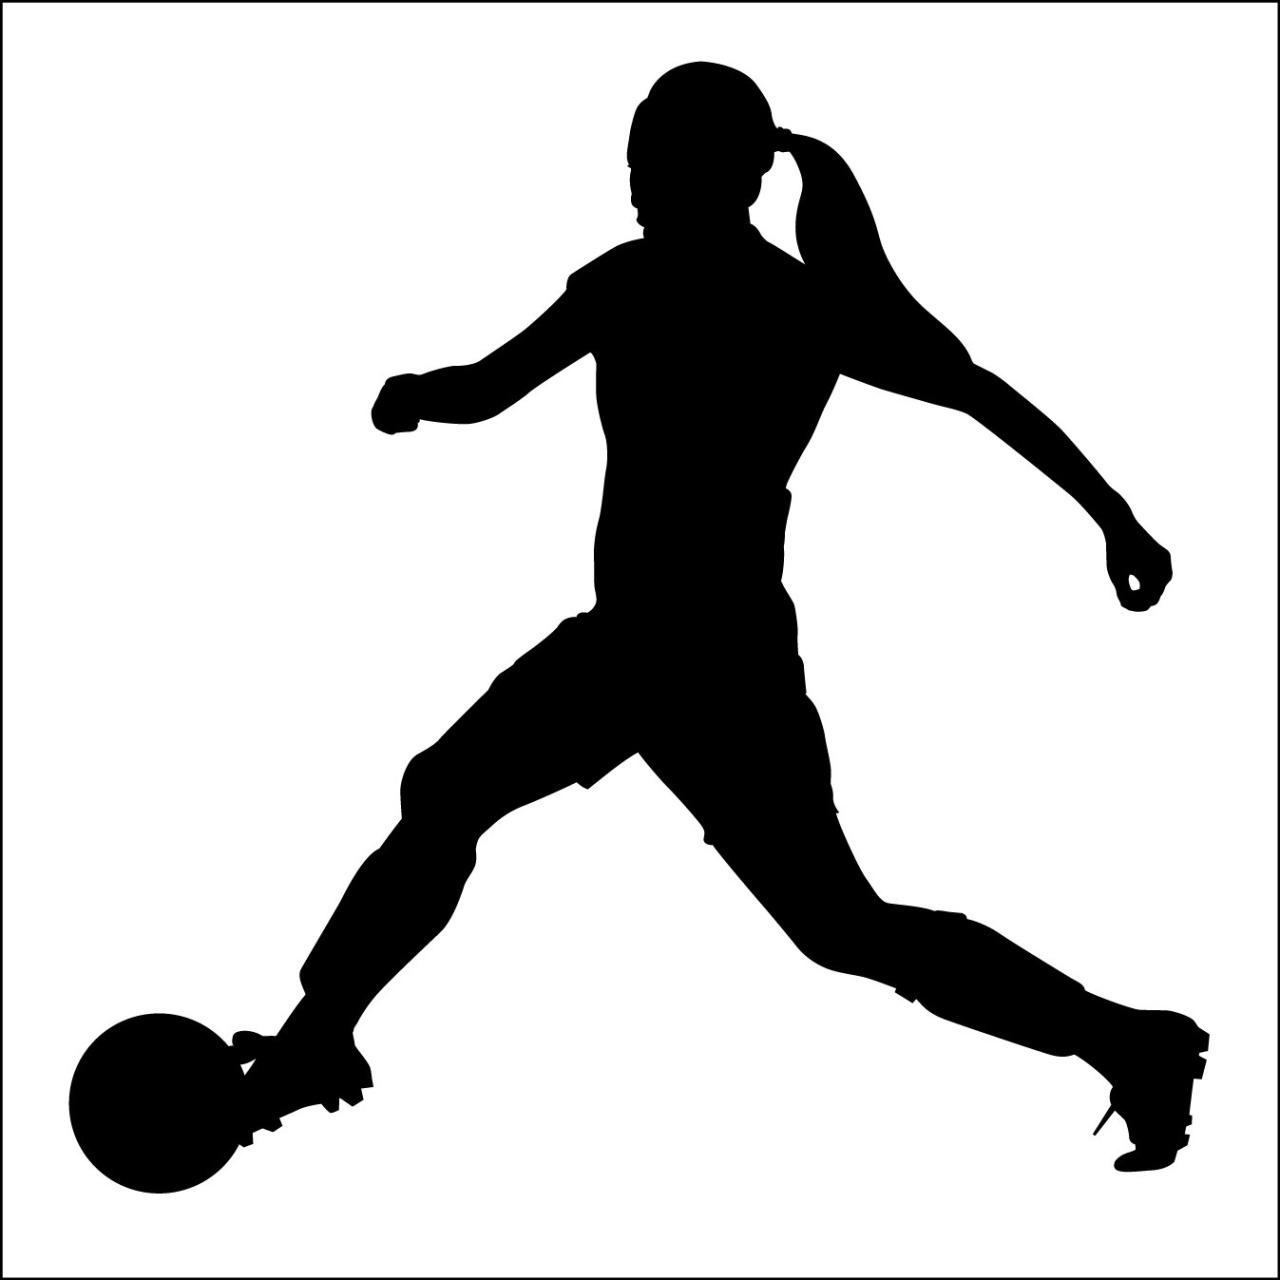 Women s soccer clipart clip black and white download Free Girls Soccer Cliparts, Download Free Clip Art, Free Clip Art on ... clip black and white download